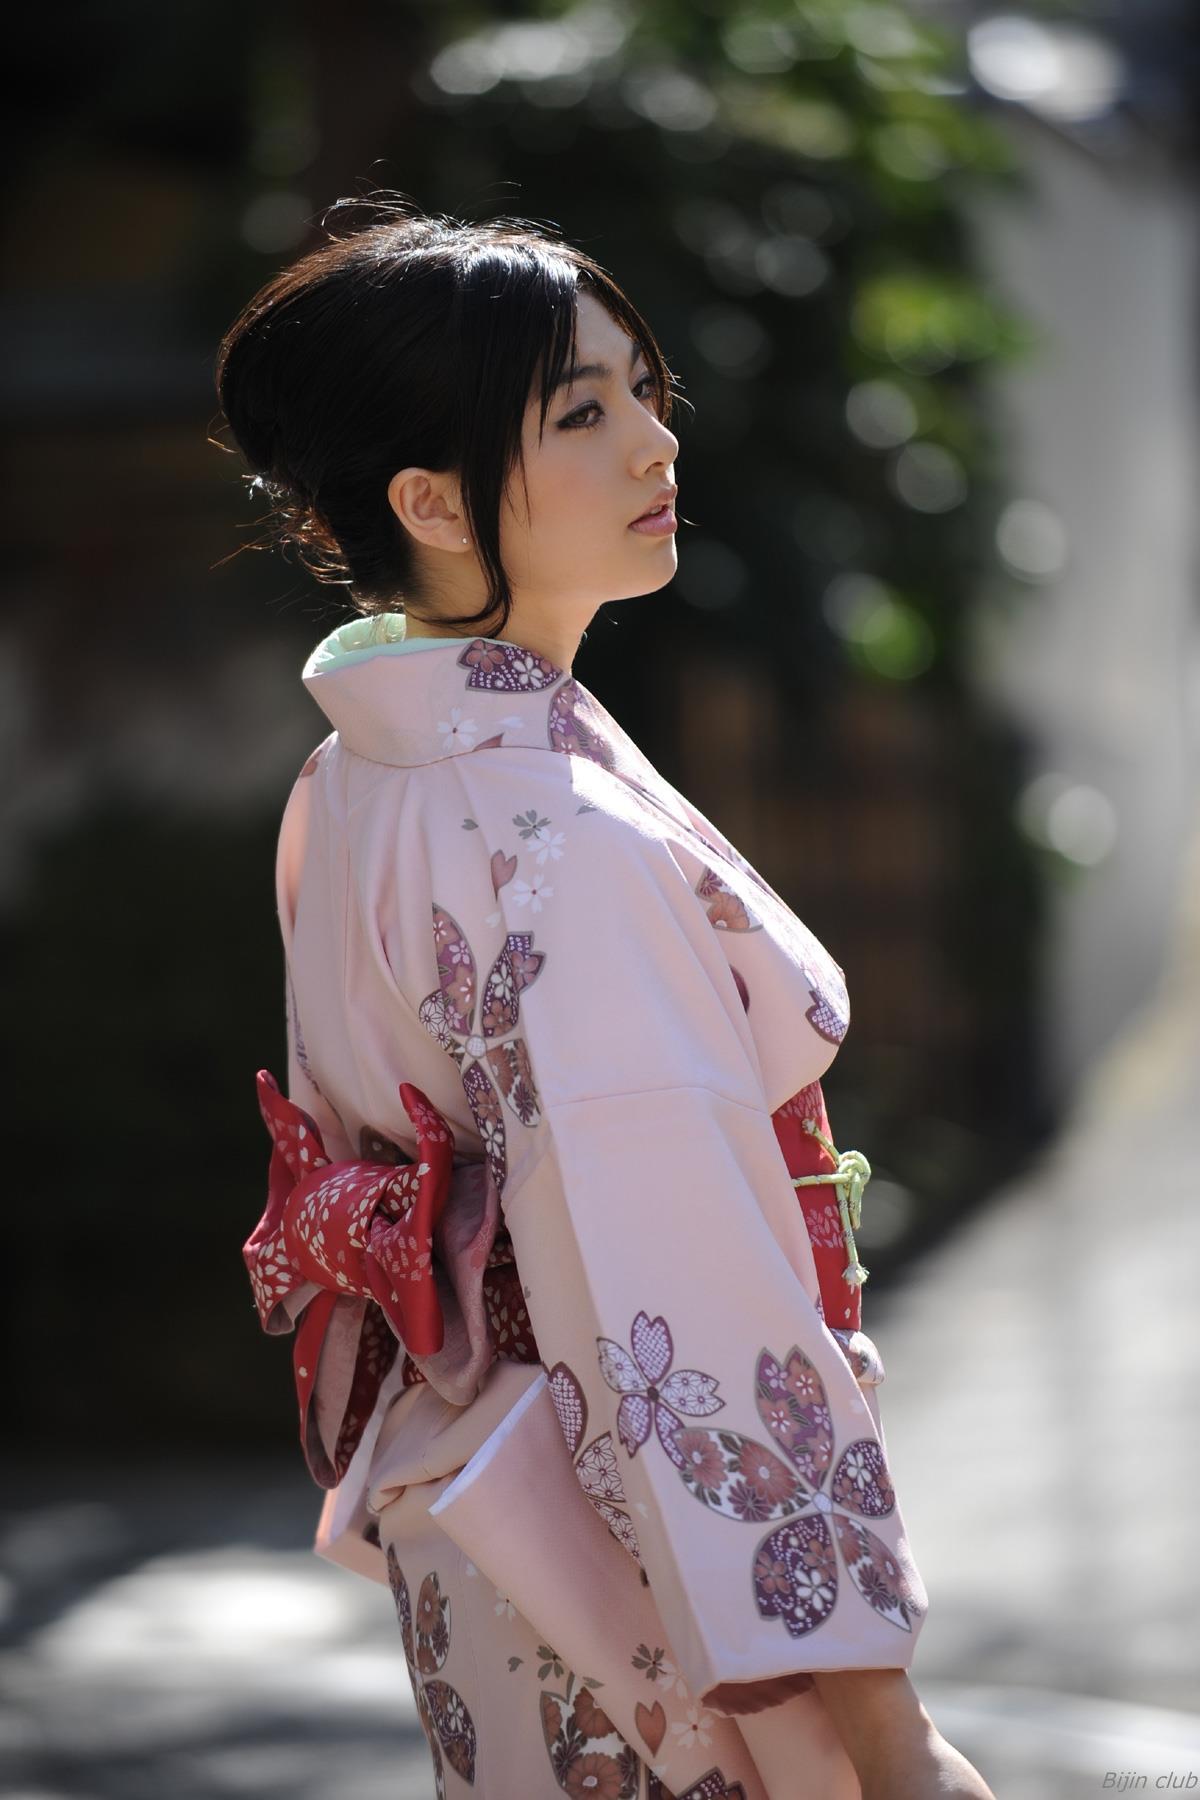 Saori_Hara_6.jpg